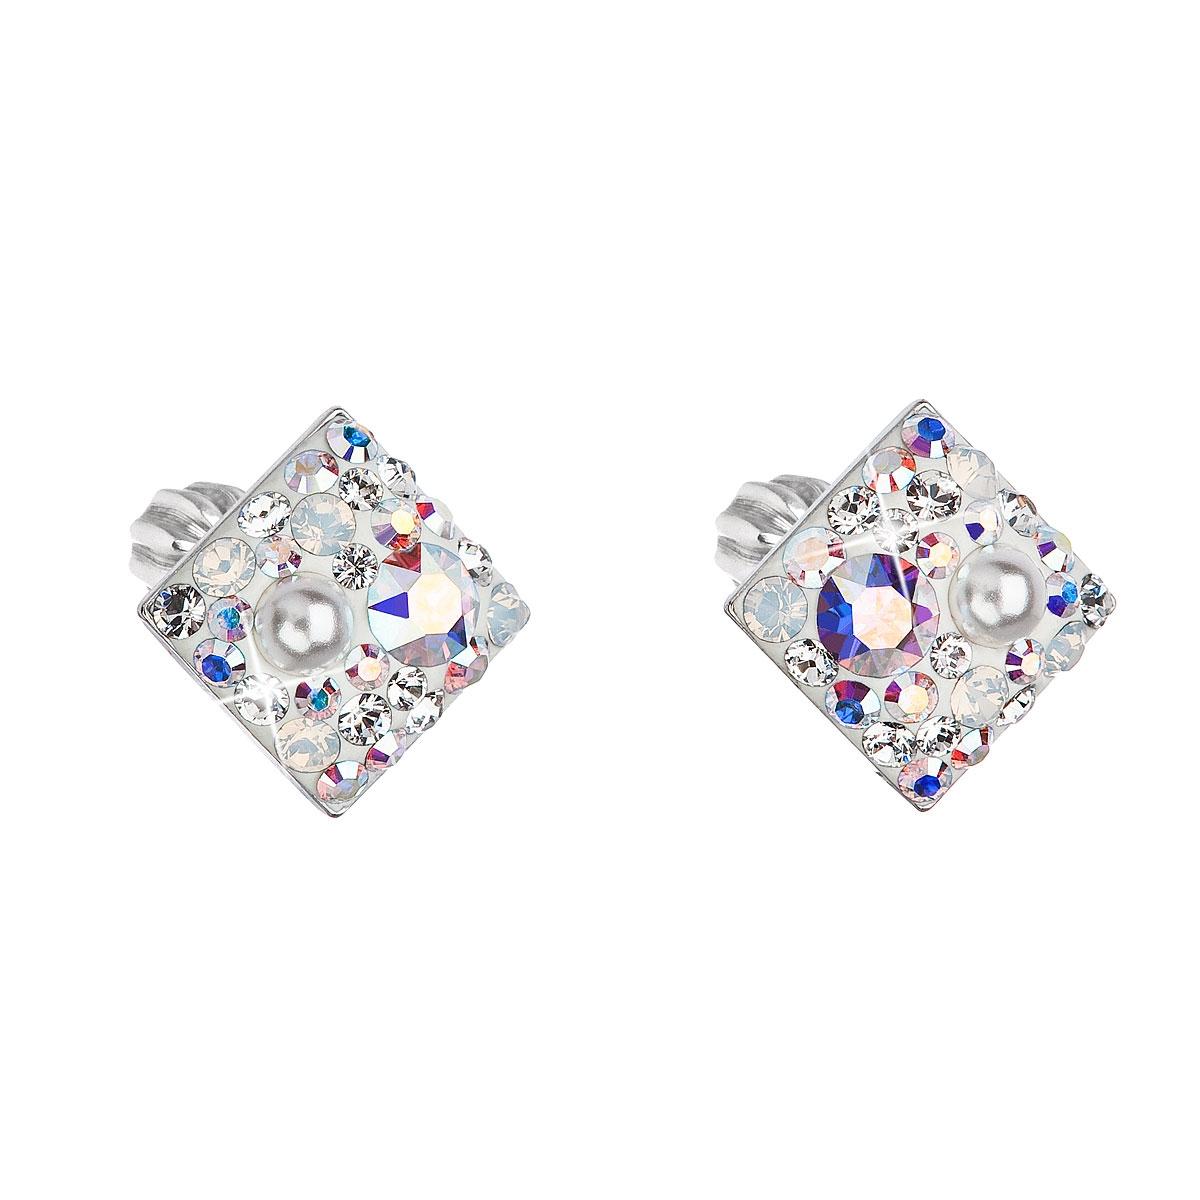 Stříbrné šroubovací náušnice s krystaly Crystals from Swarovski® CRYSTAL AB EG2006-CRAB